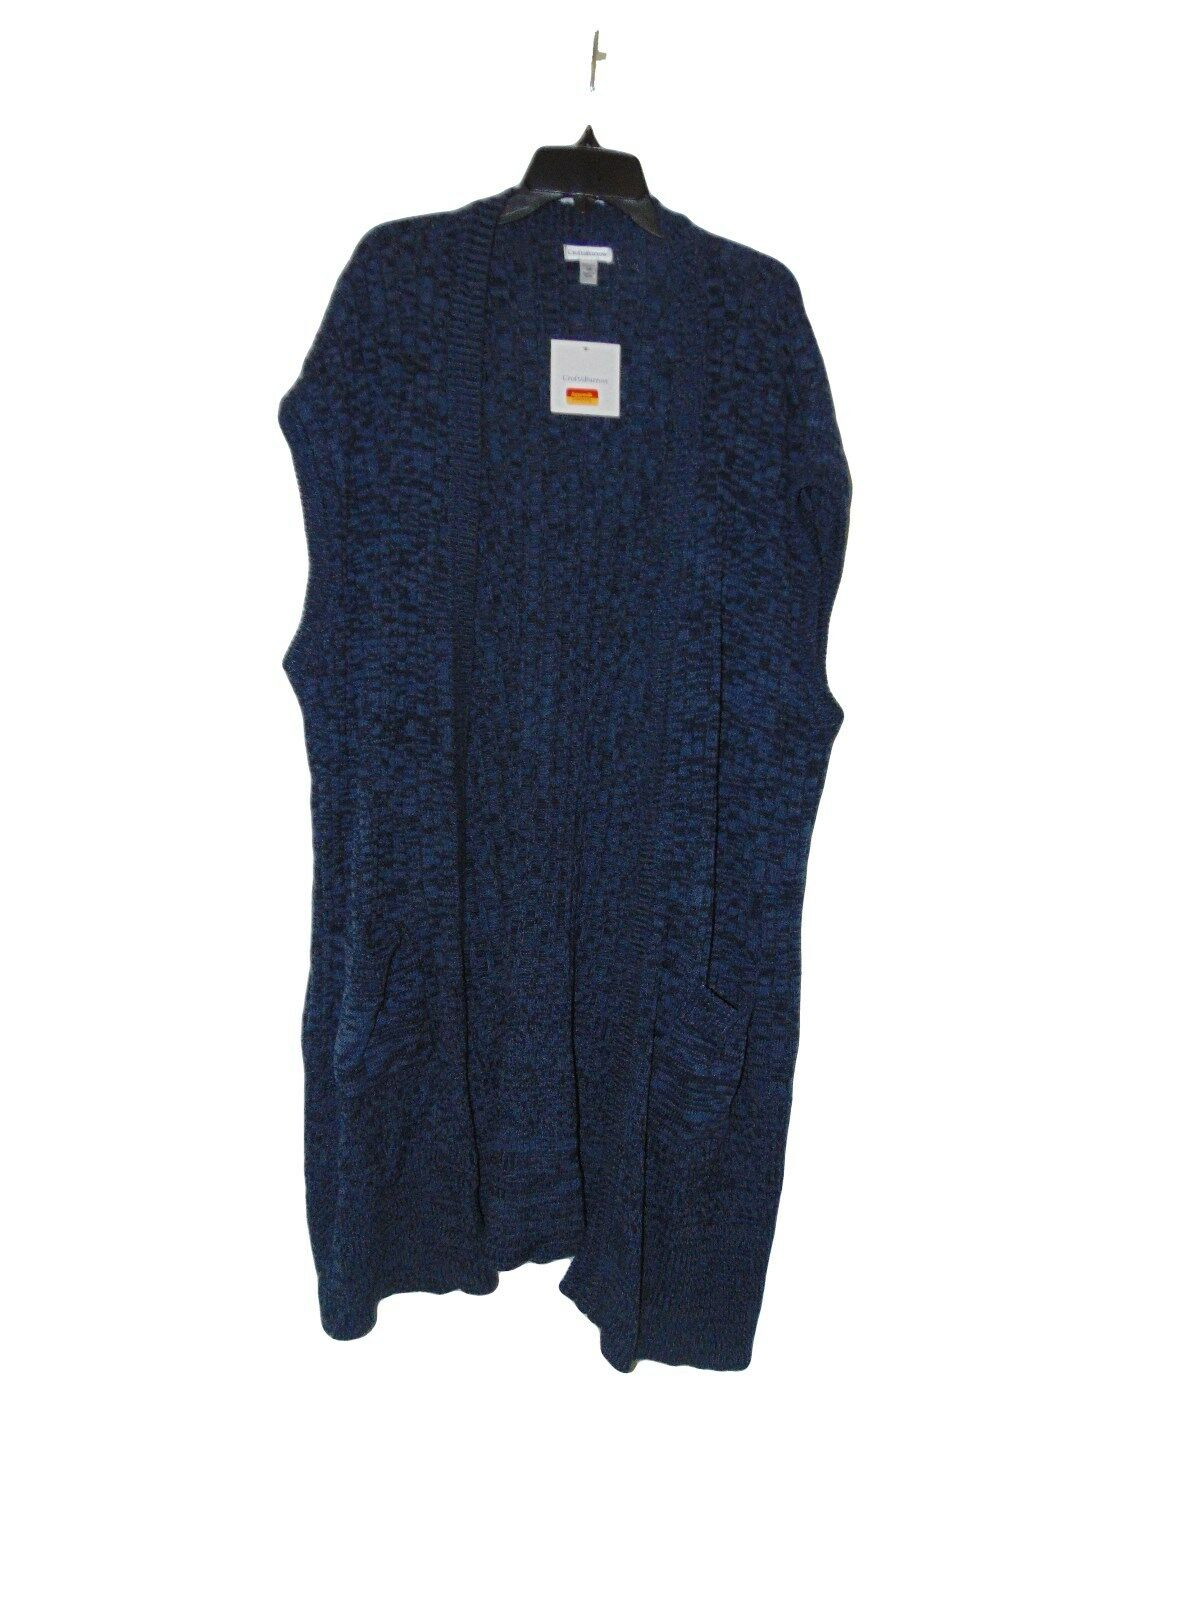 Croft & Barrow Women's Sweater Vest Size 3x Long Shrug Duster ...